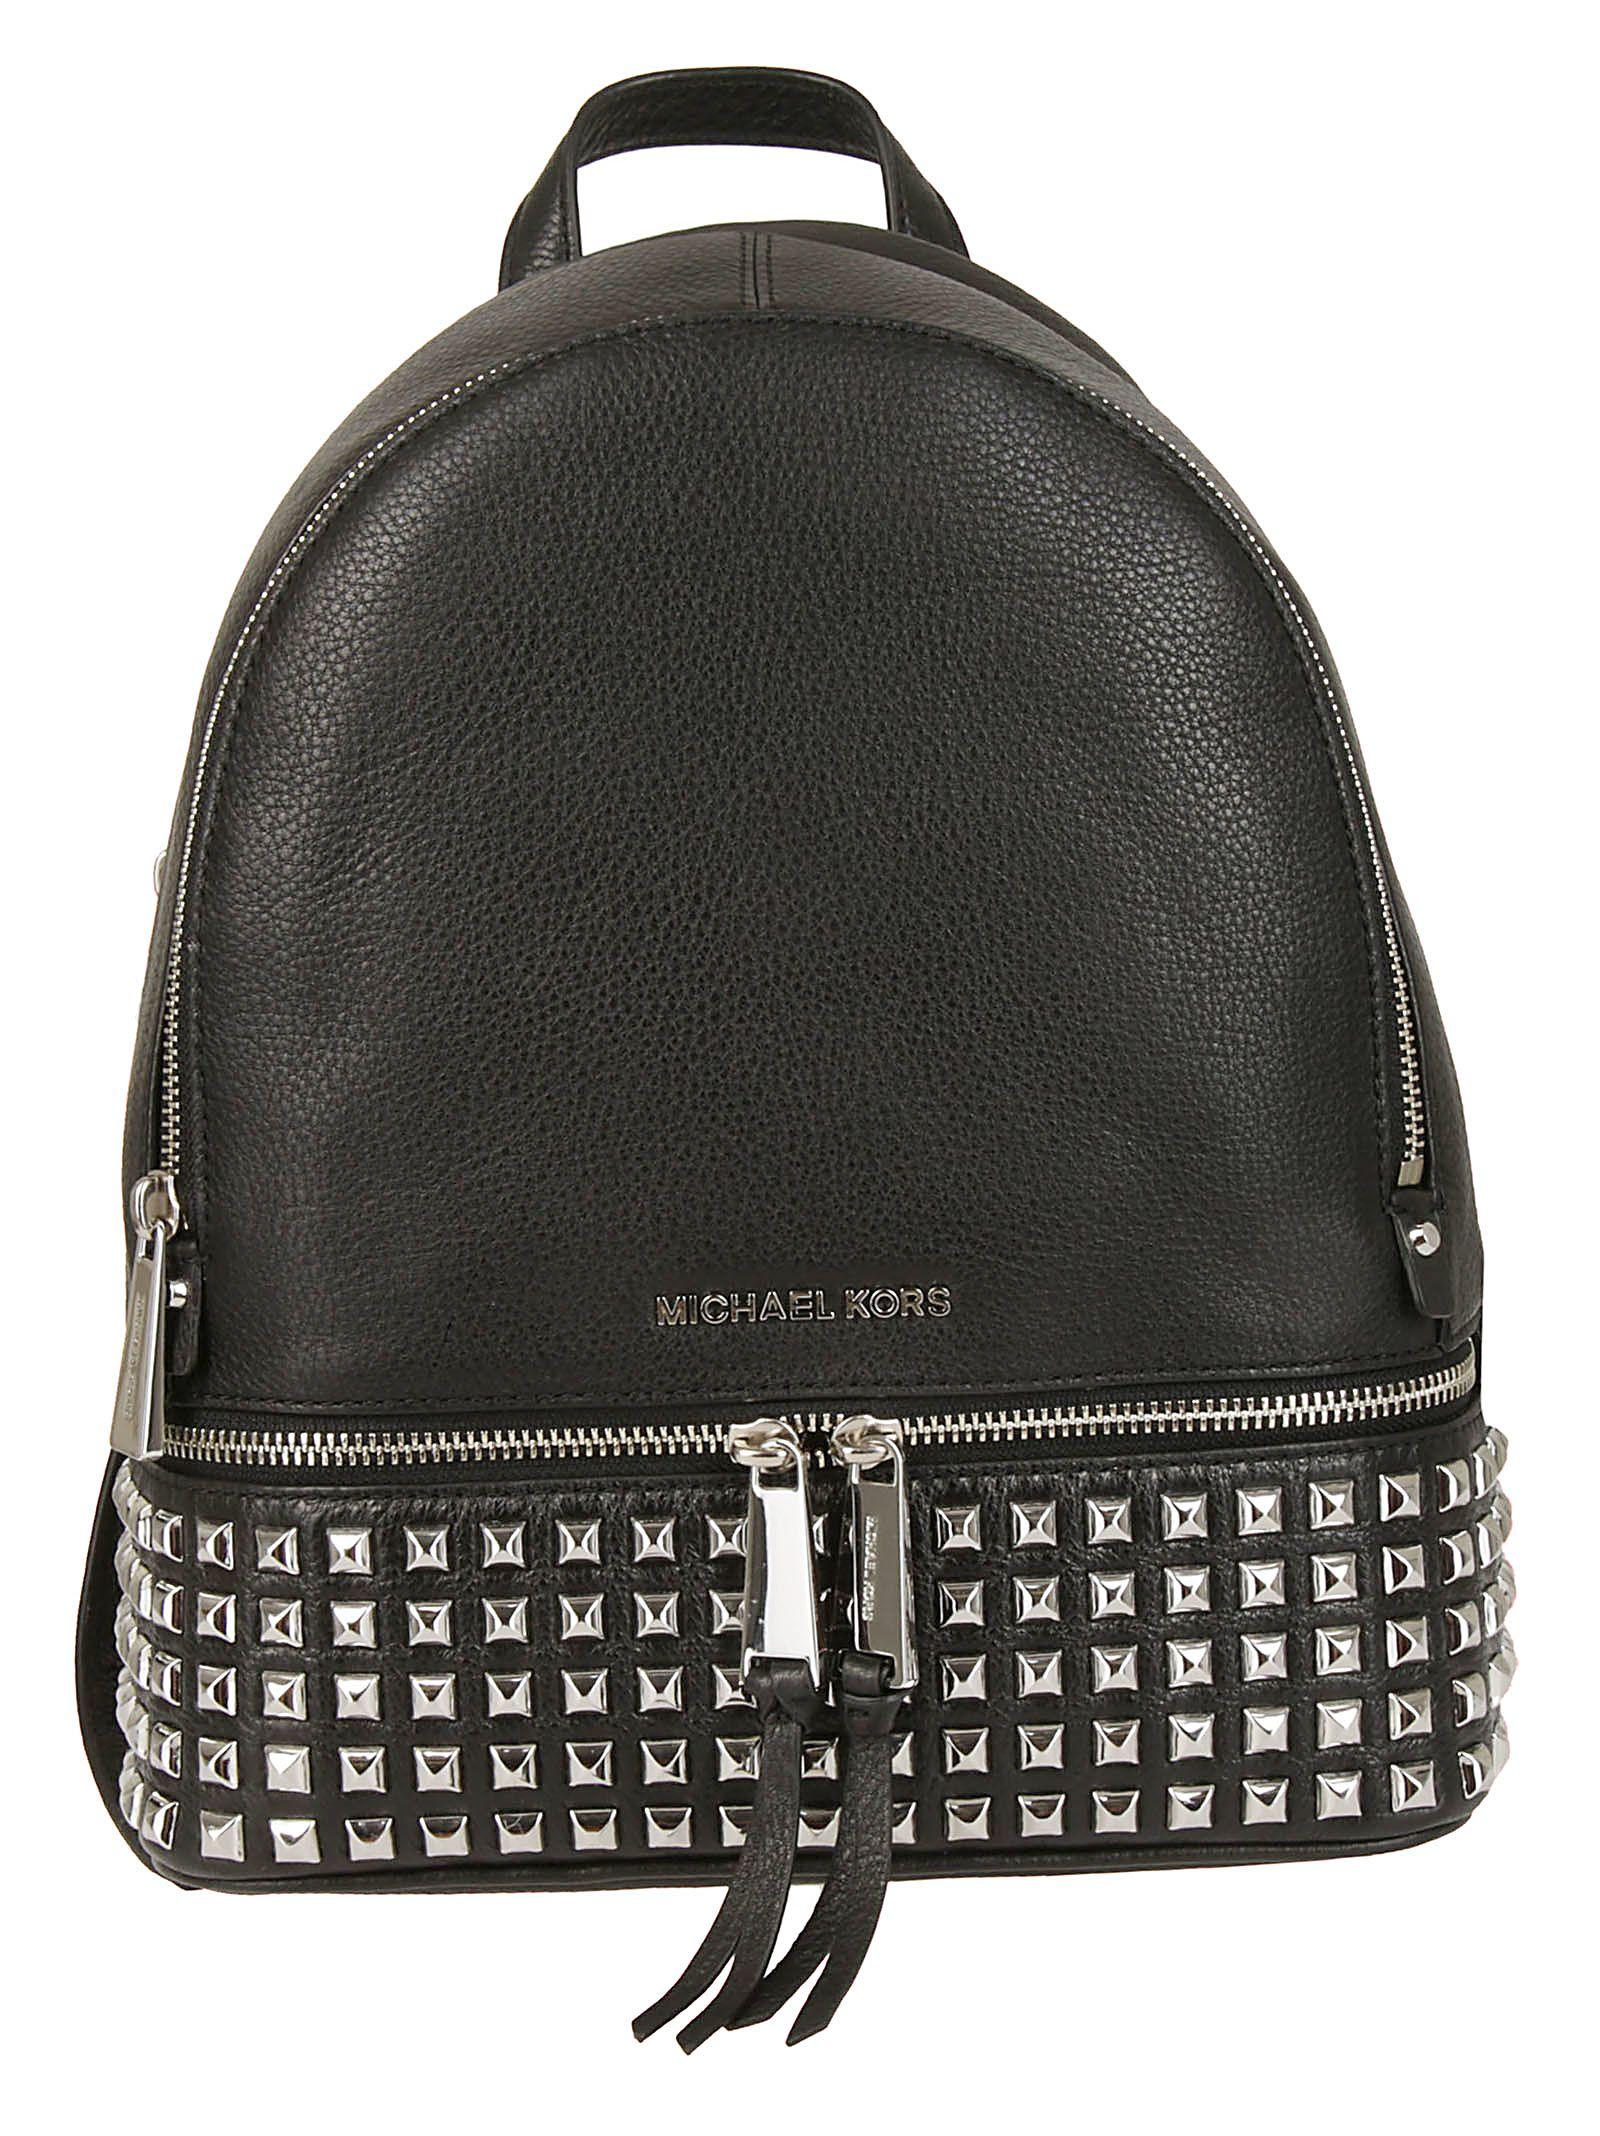 f2356cd58f09 ... closeout michael kors rhea studded backpack nero argento 85f09 cd0d8